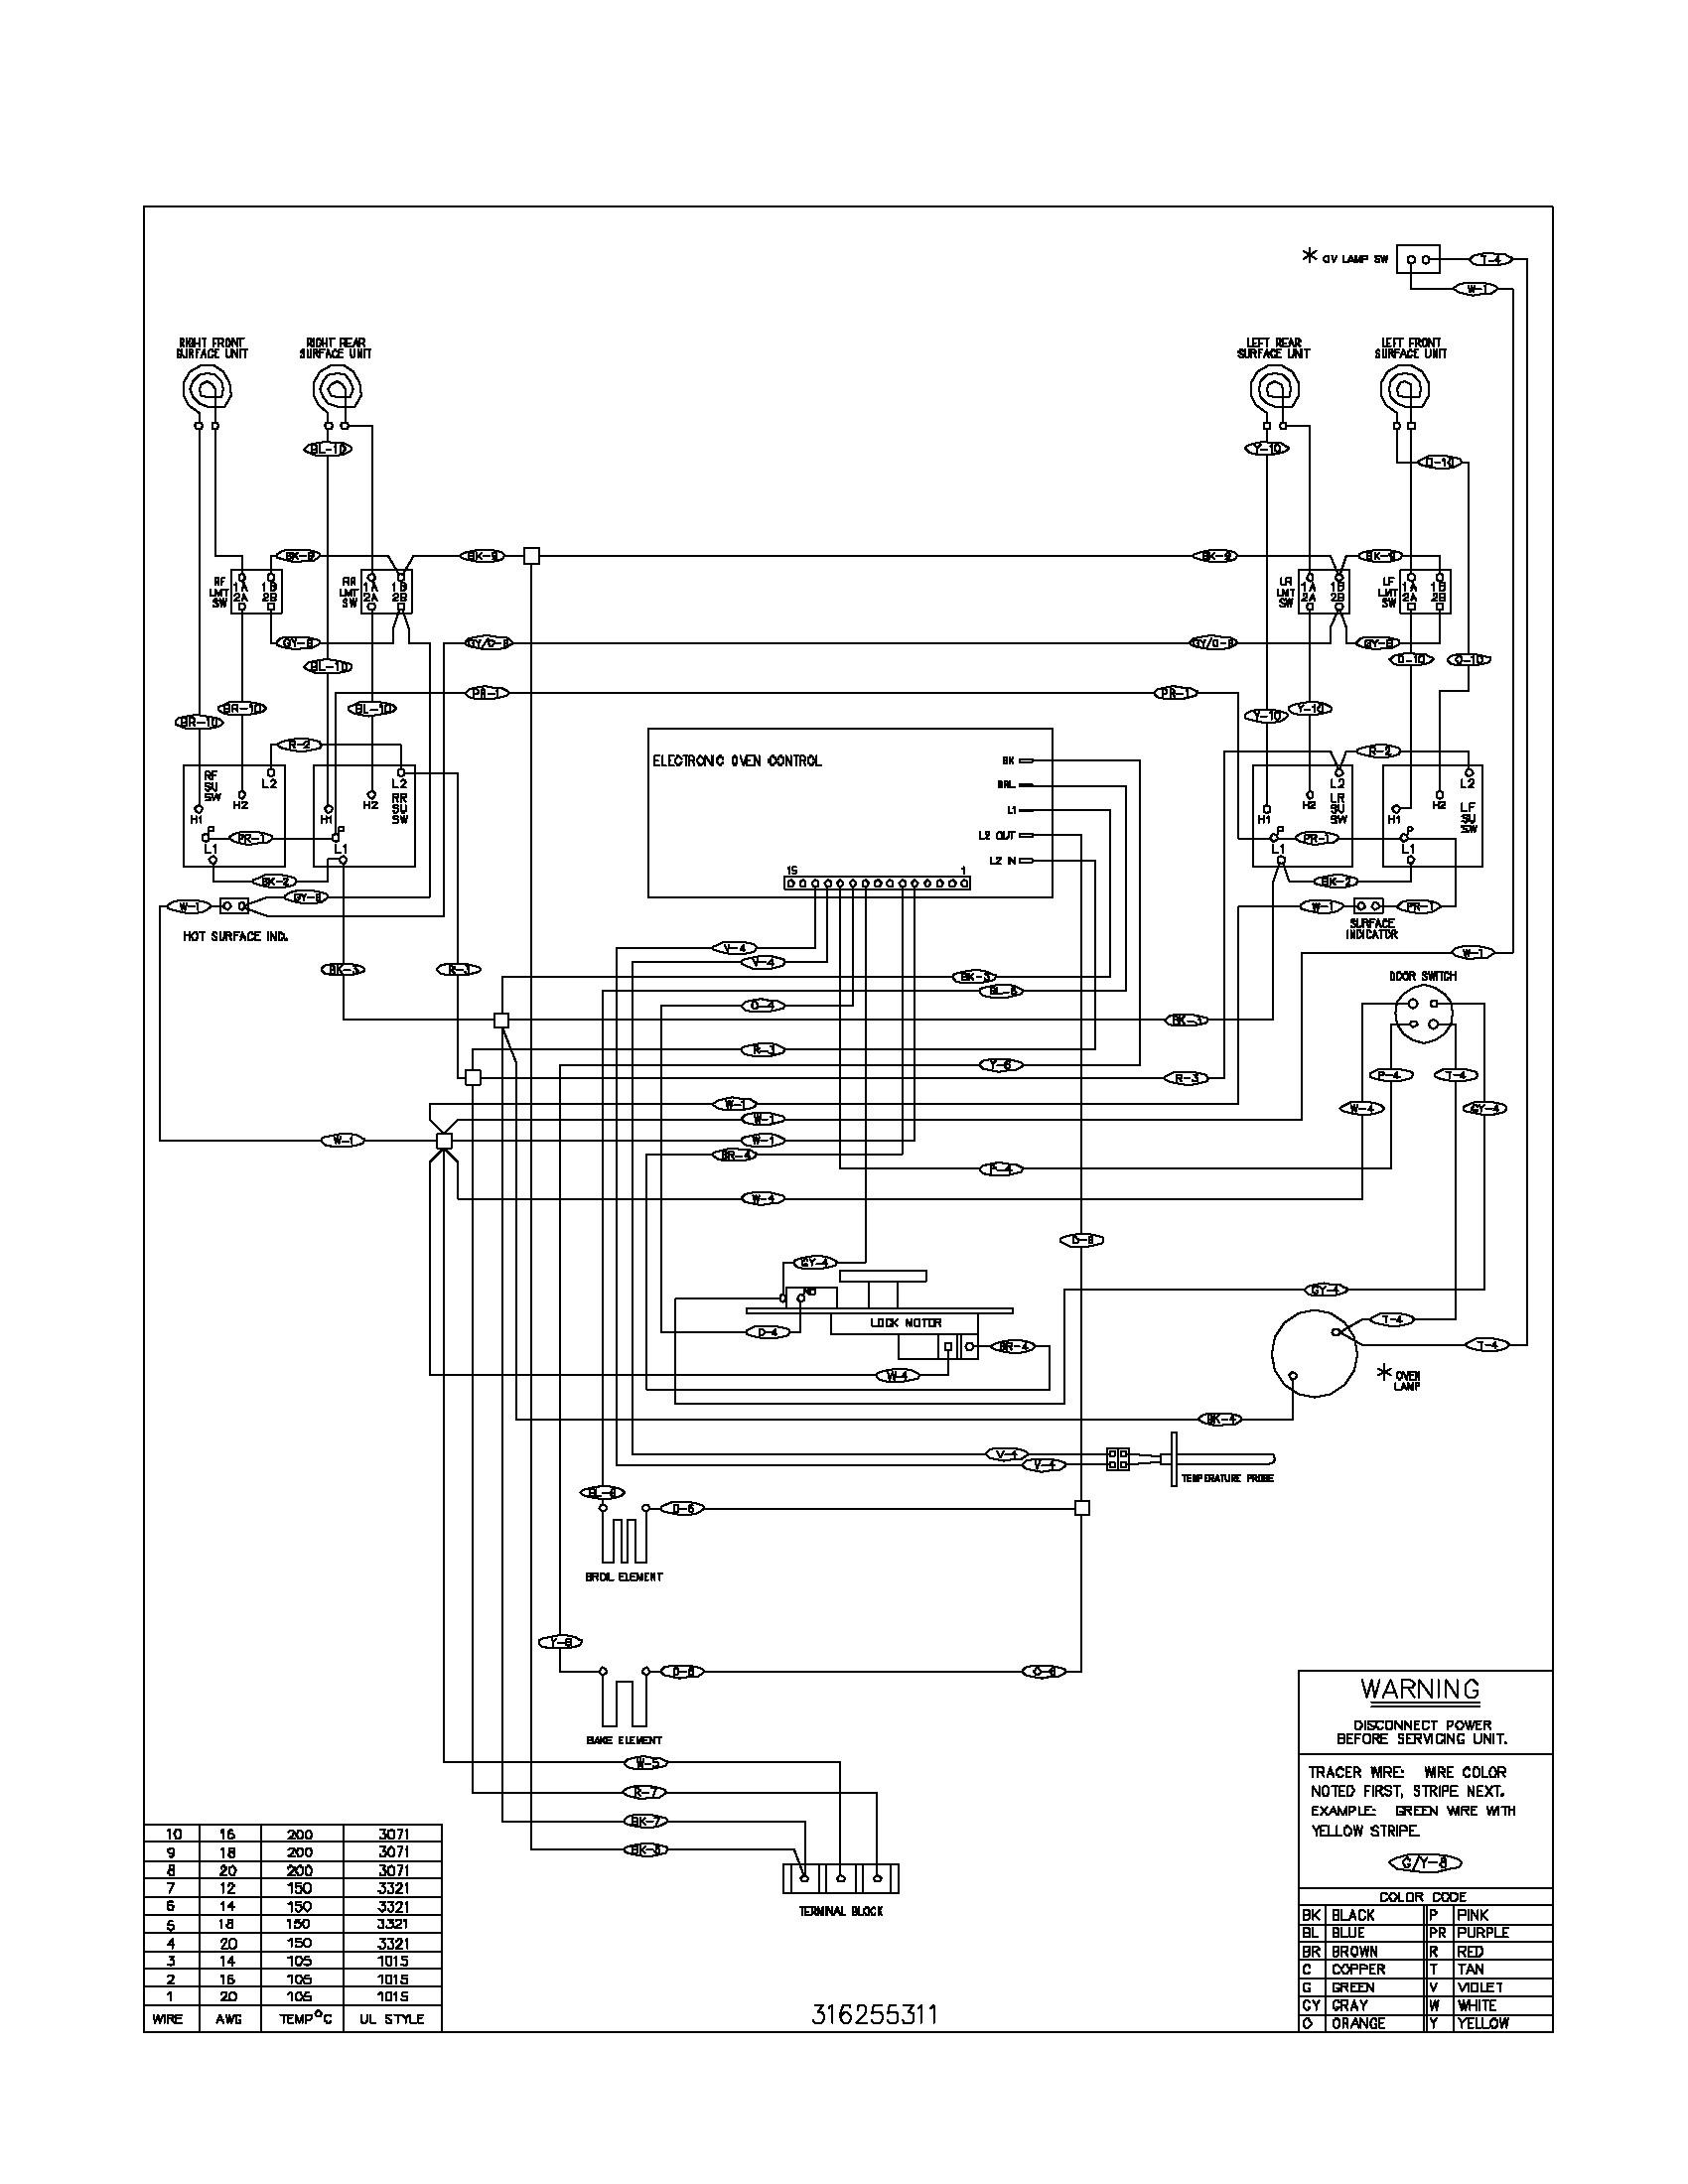 Light Switch Wiring Single Pole How To X3cbx3ewiring Wire Ge Washing Machine Diagram For